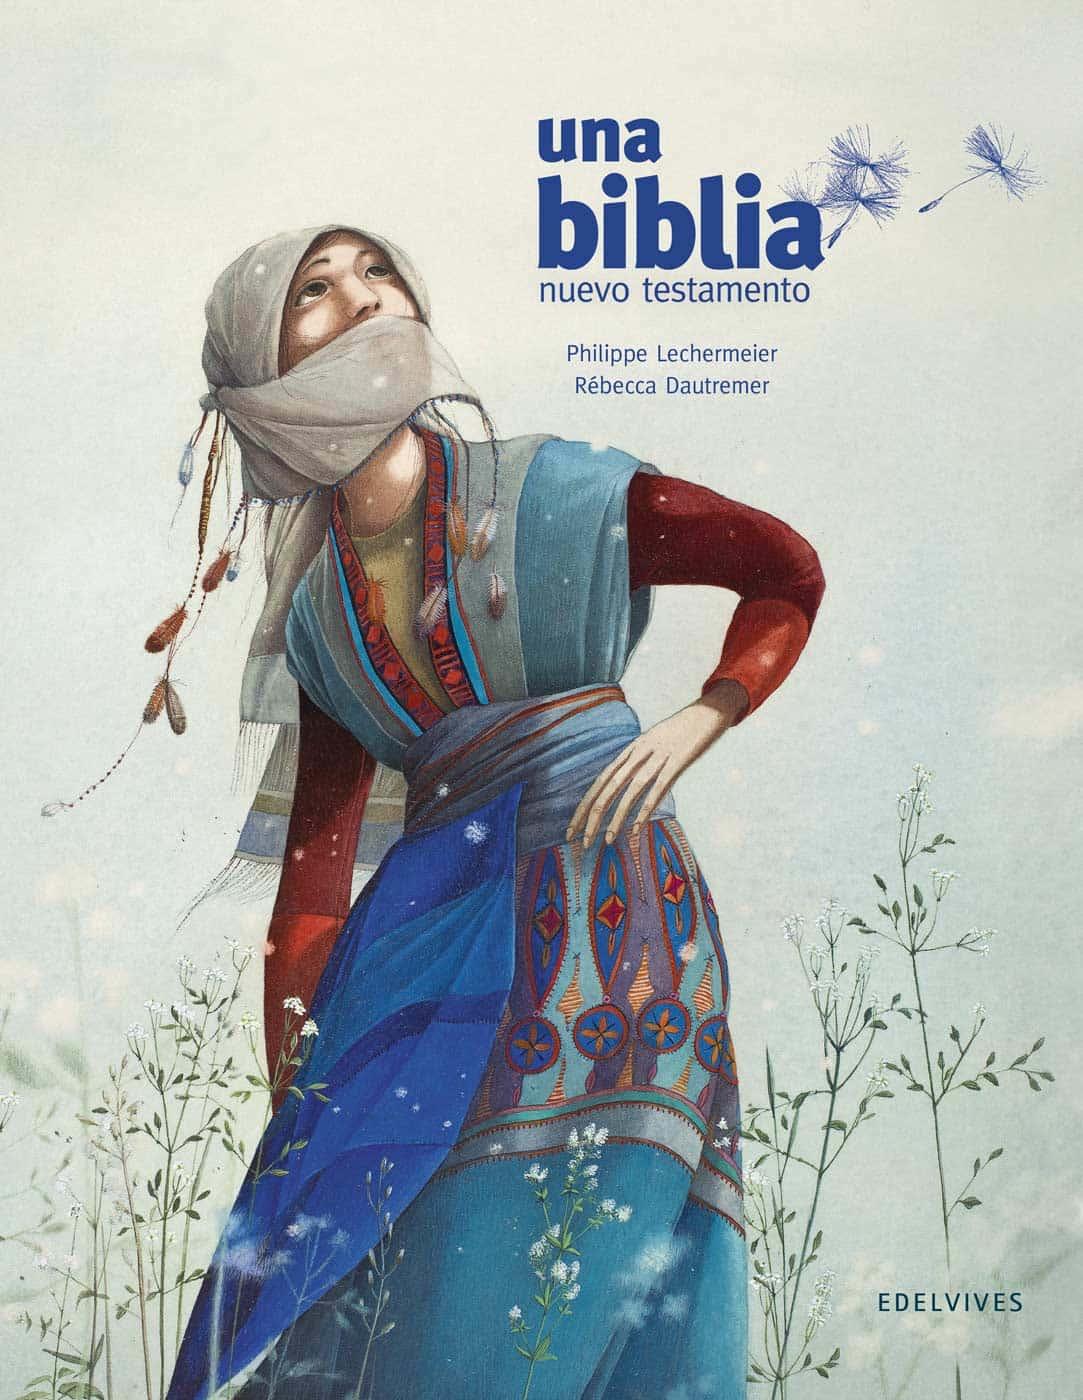 UNA BIBLIA. NUEVO TESTAMENTO (ILUSTRADO POR REBECCA DAUTREMER)